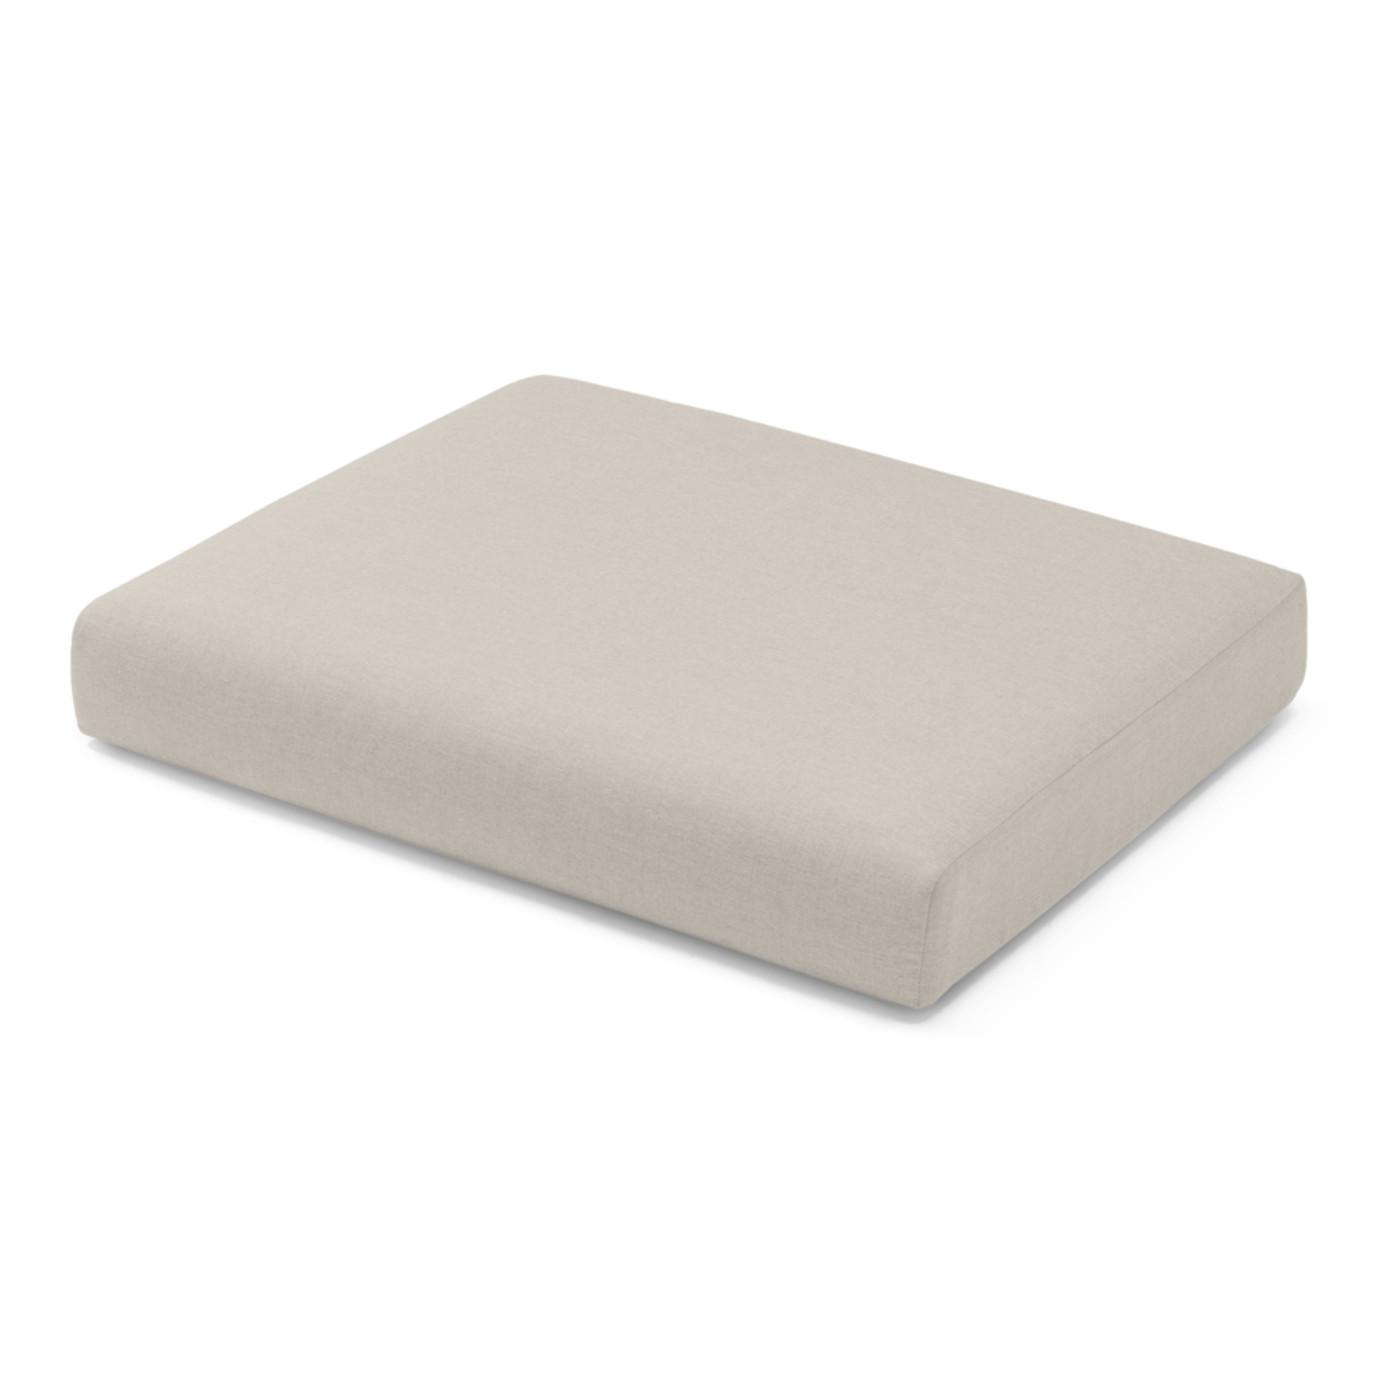 Portofino Comfort Armless Chair Base Cushion - Taupe Mist